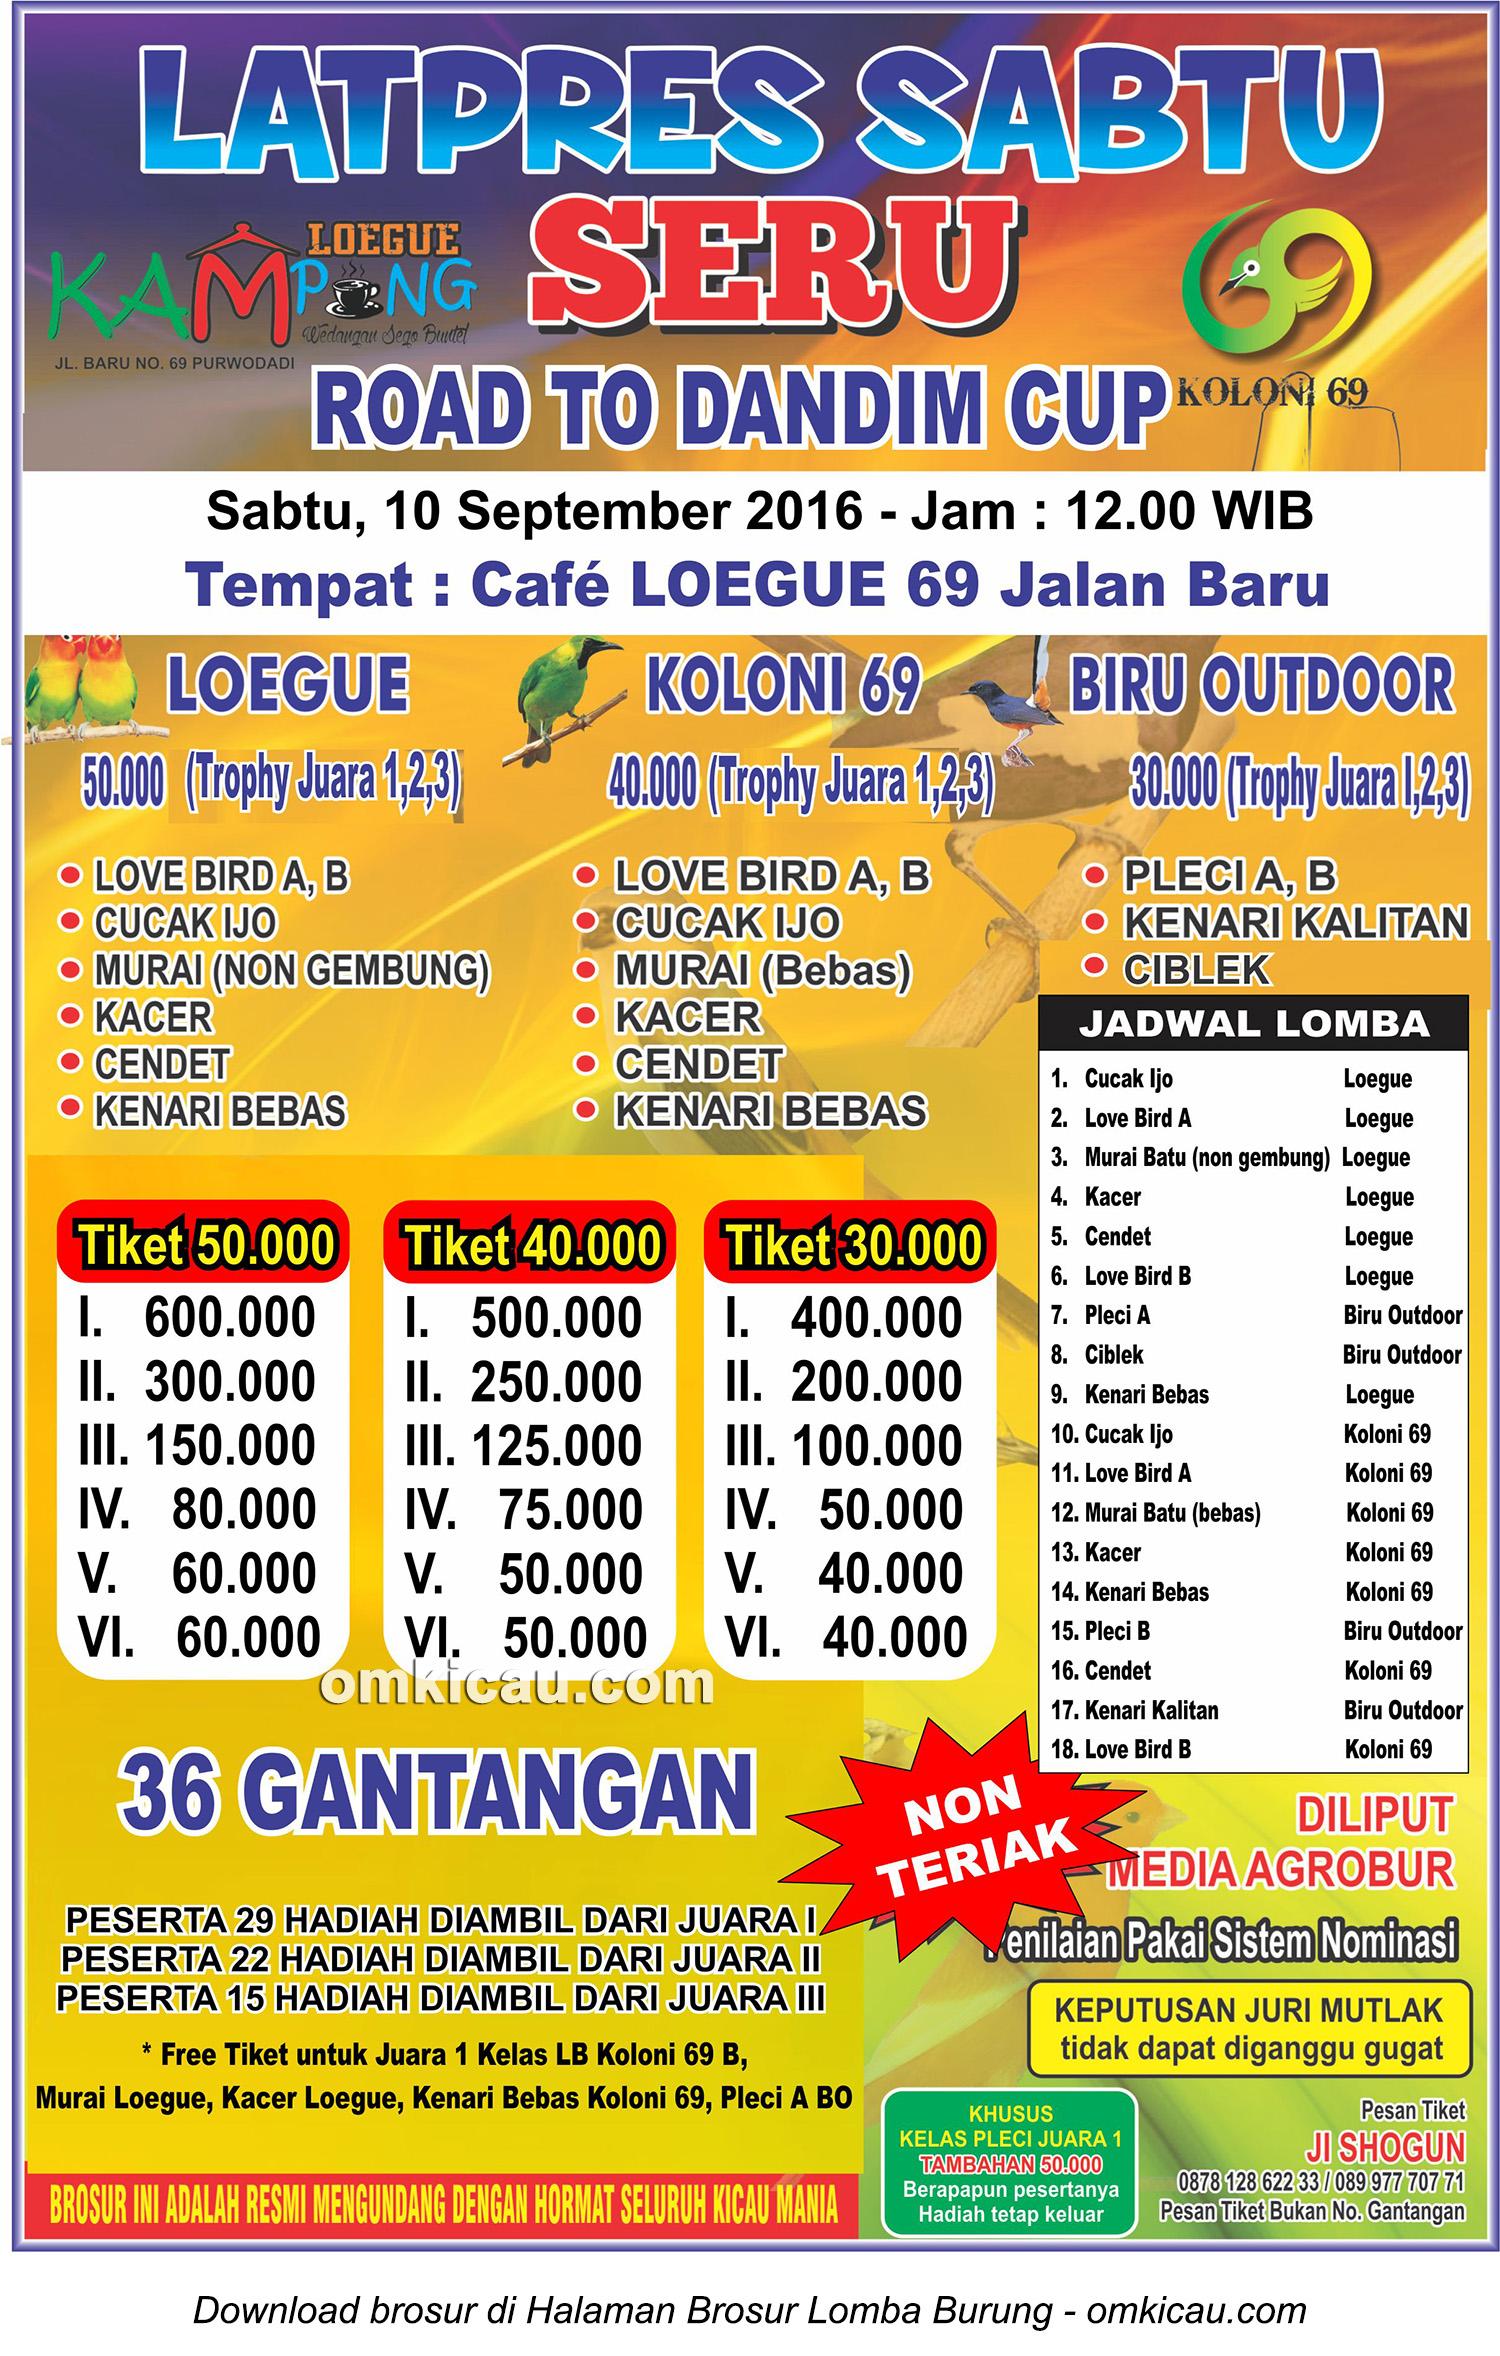 Brosur Latpres Sabtu Seru Road to Dandim Cup, Purwodadi, 10 September 2016